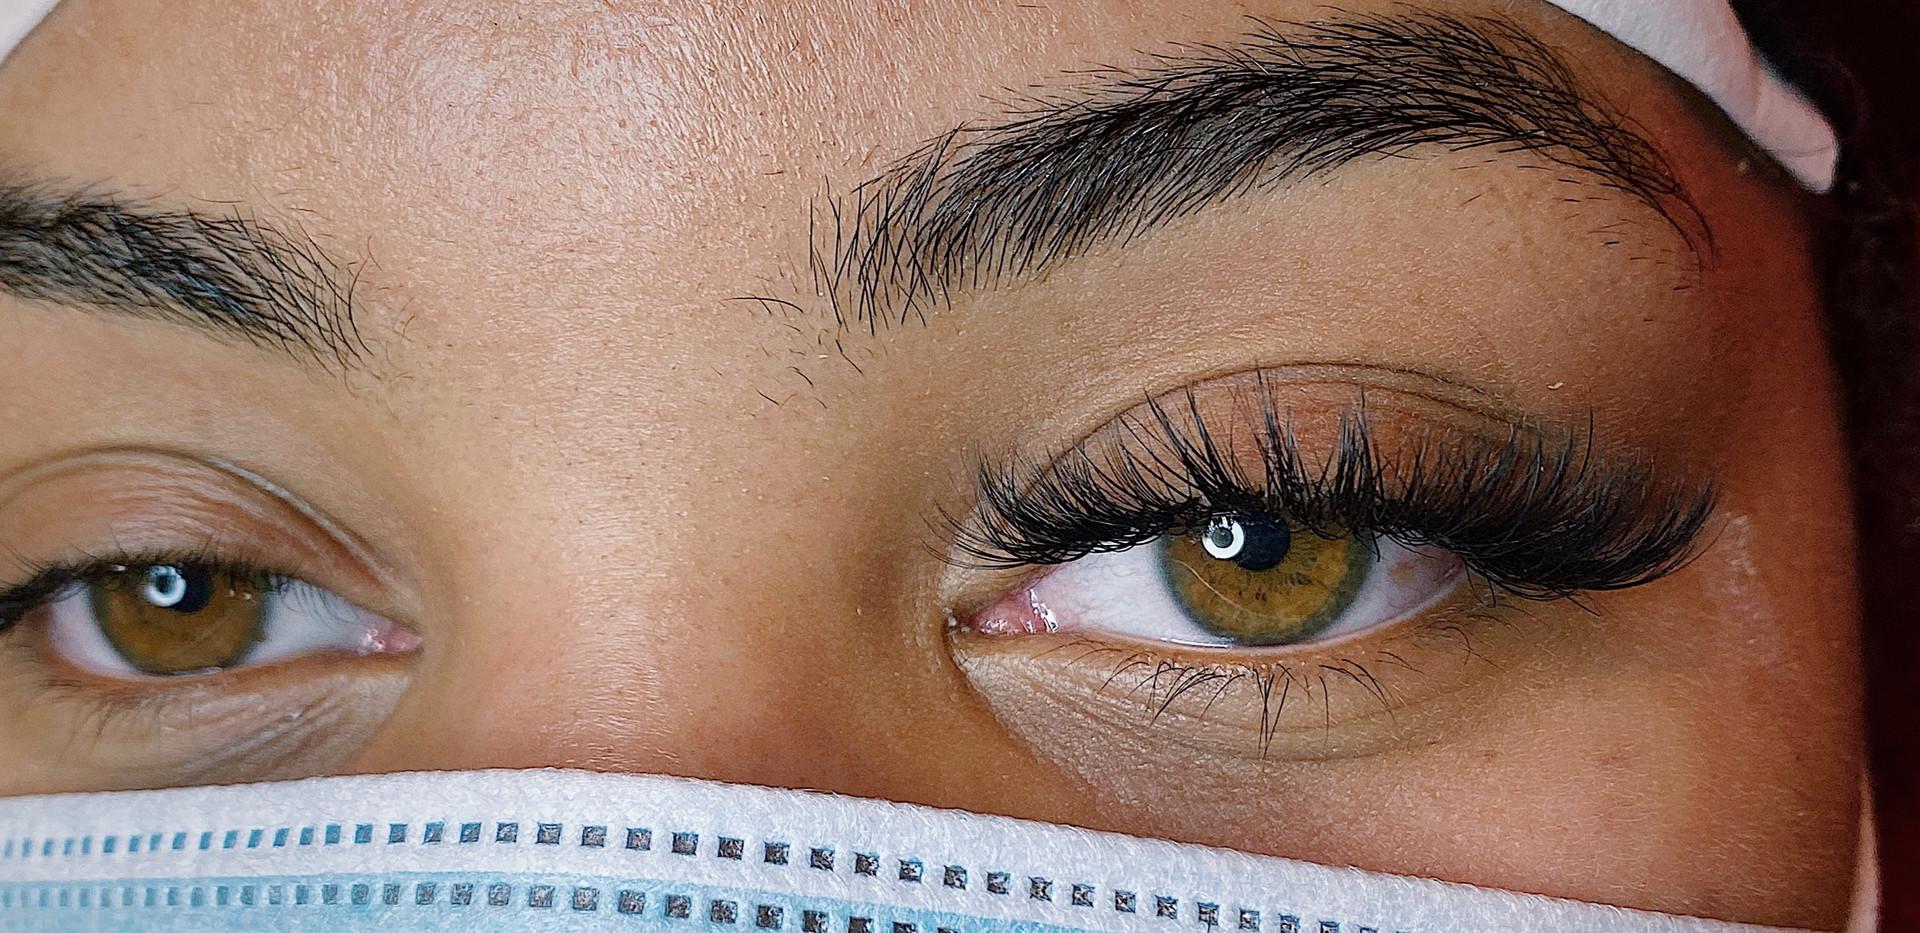 Fierce lashes